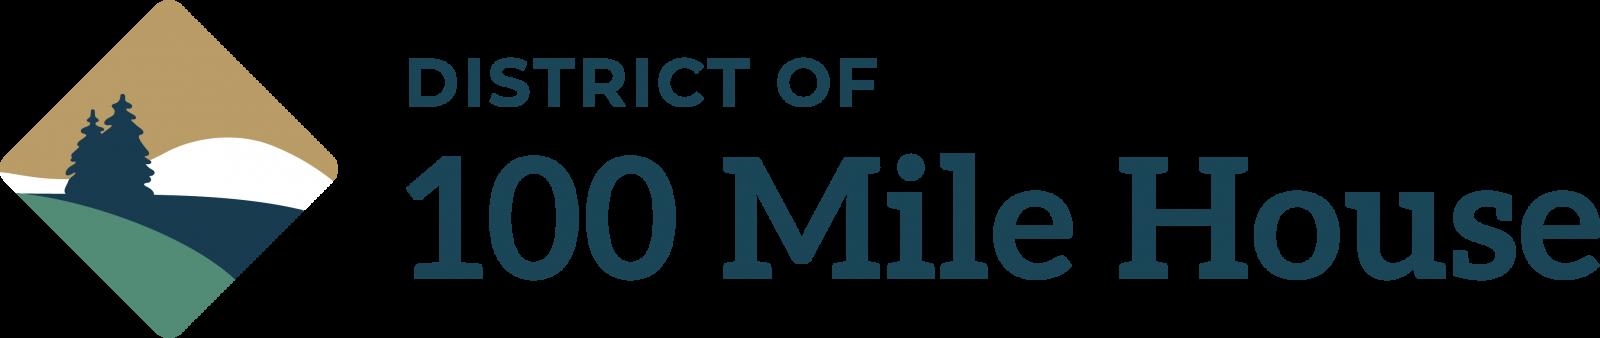 100 Mile House